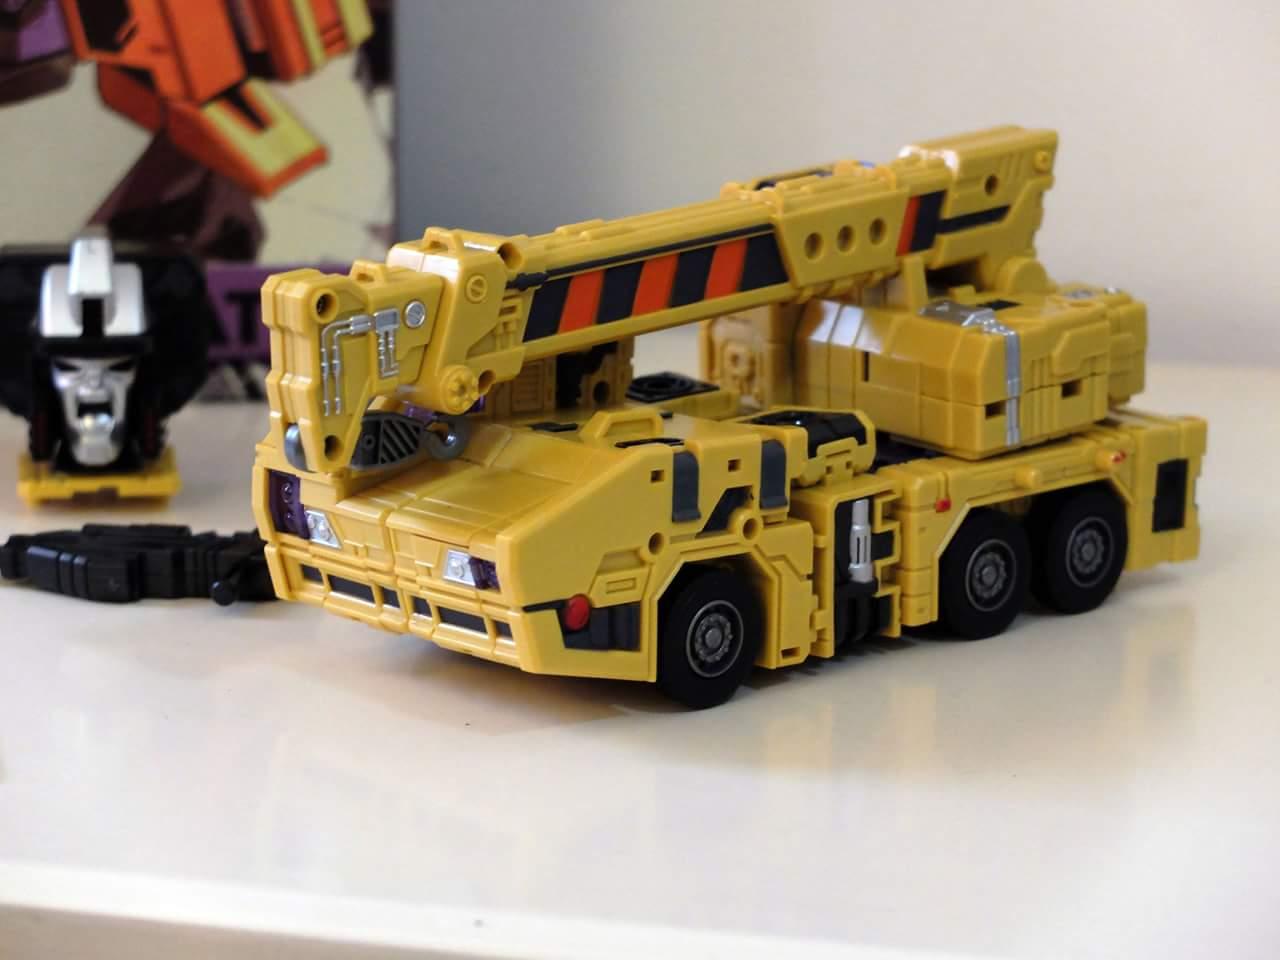 [Toyworld] Produit Tiers - Jouet TW-C Constructor aka Devastator/Dévastateur (Version vert G1 et jaune G2) - Page 8 LVEsmnZM